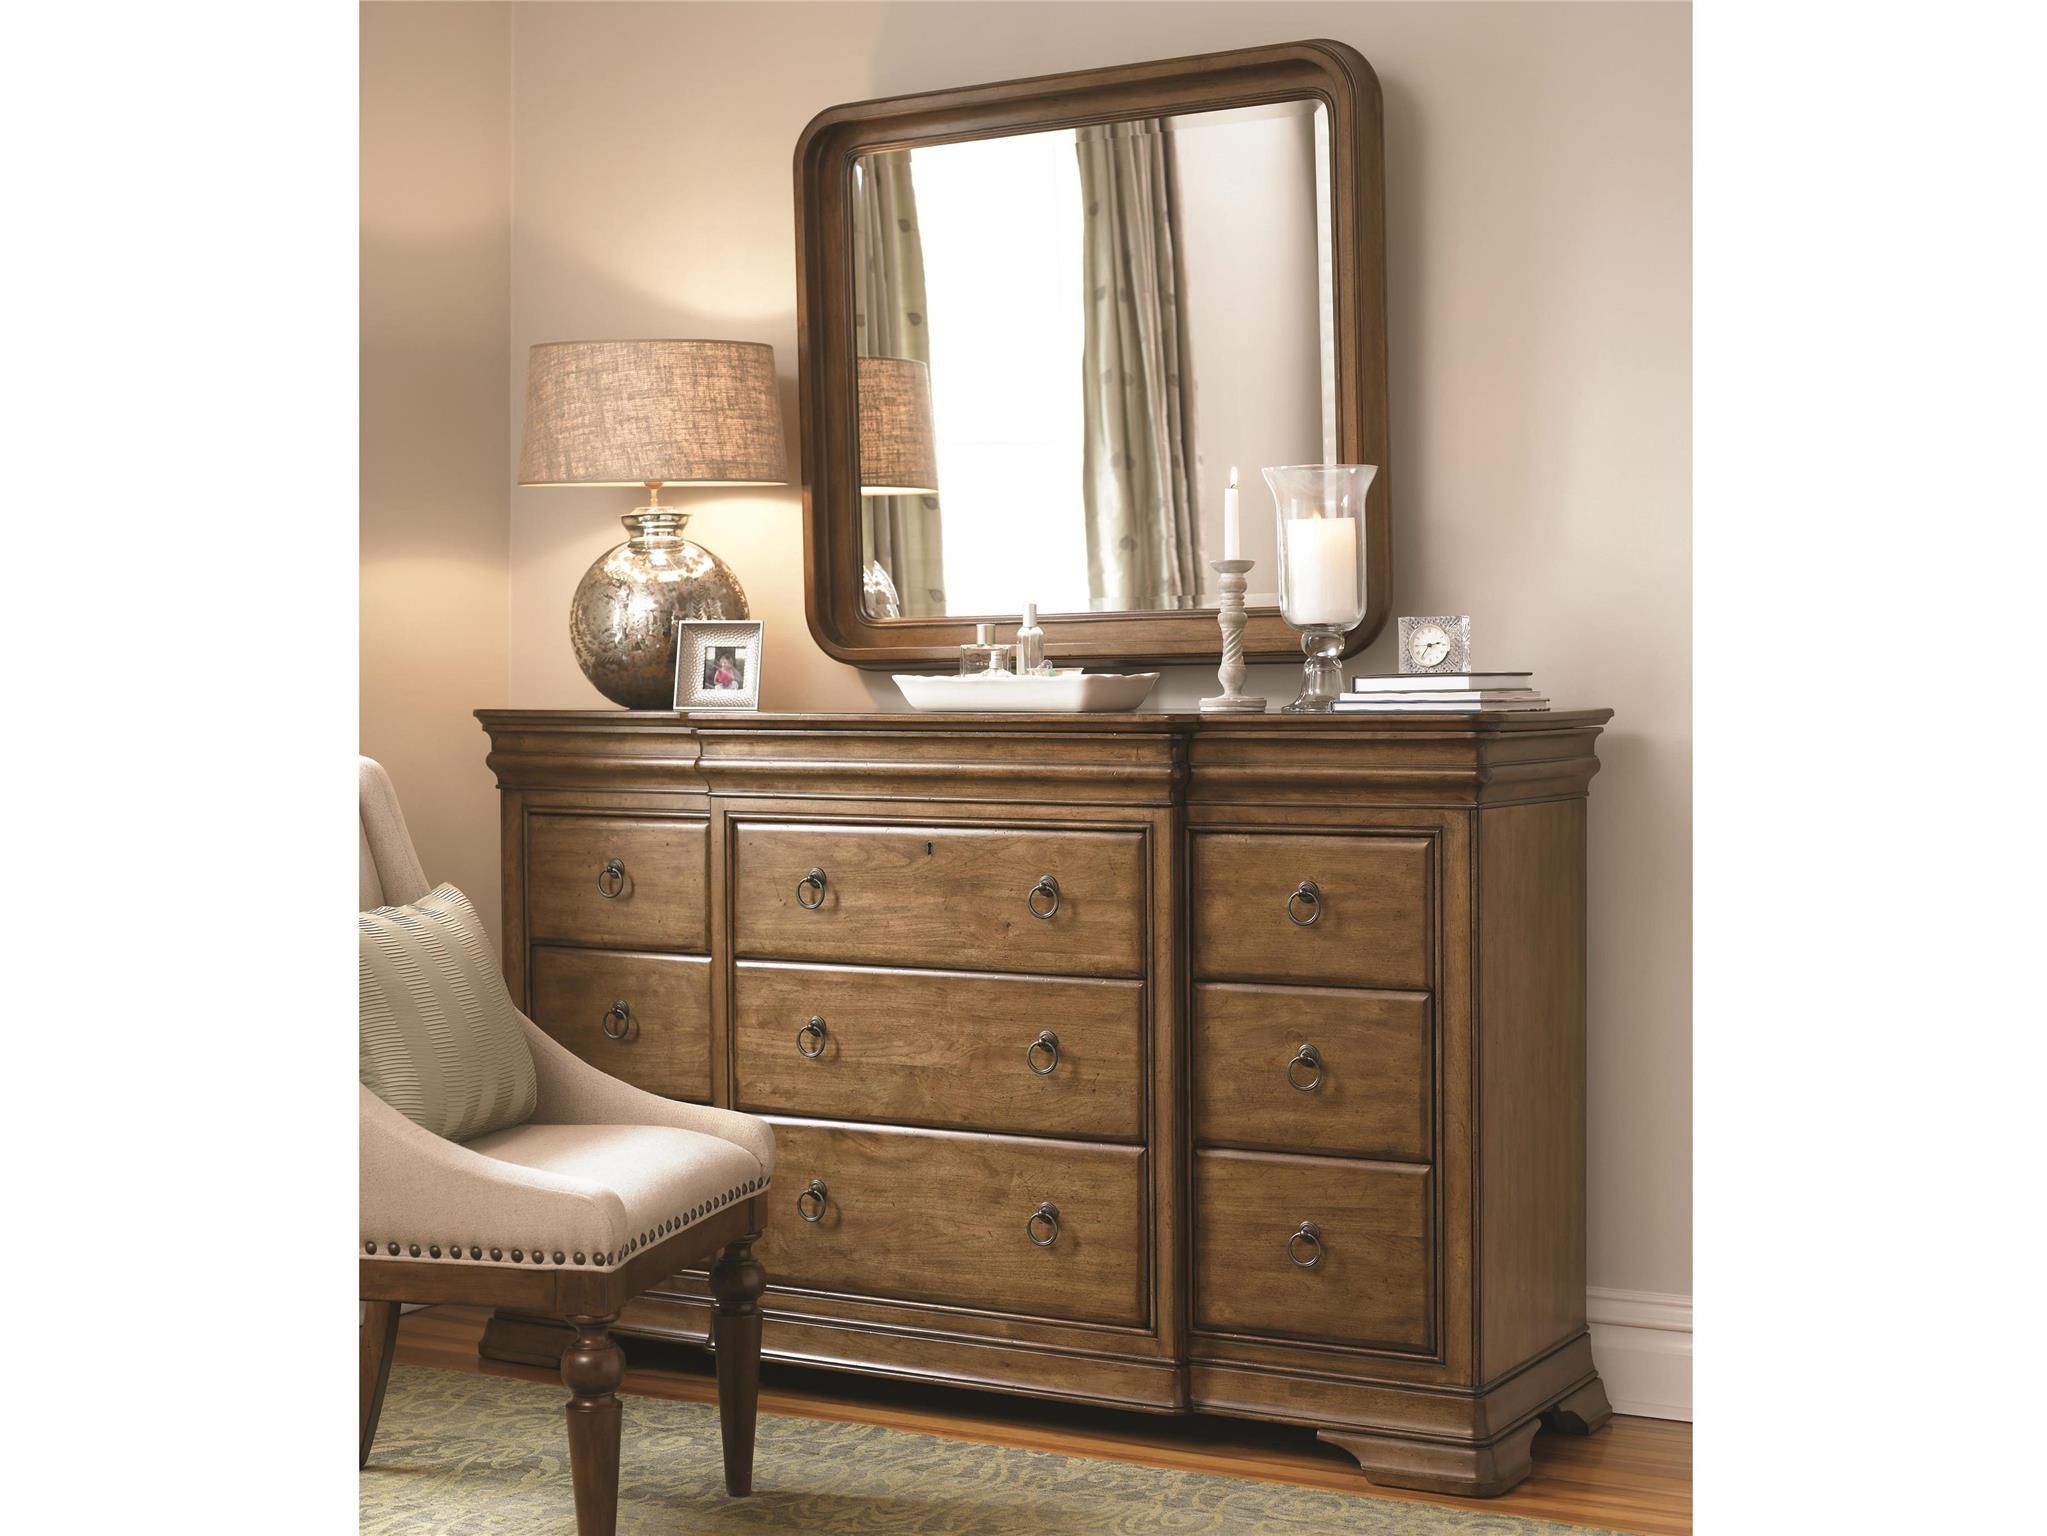 Superieur 71040. New Lou Drawer Dresser